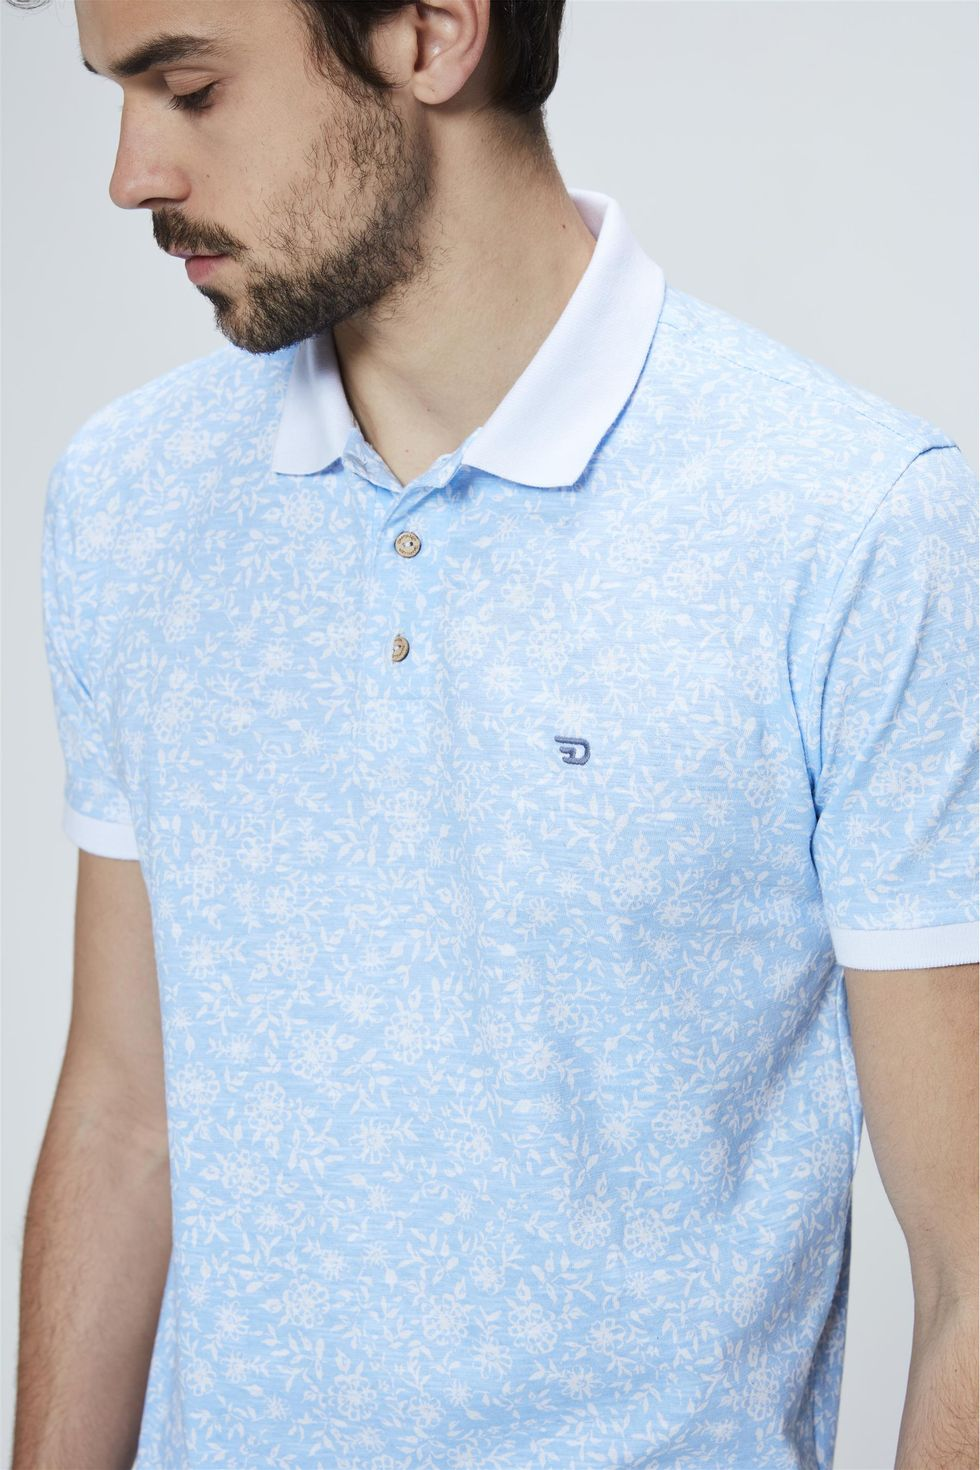 Camisa-Polo-com-Estampa-Floral-Masculino-Frente--